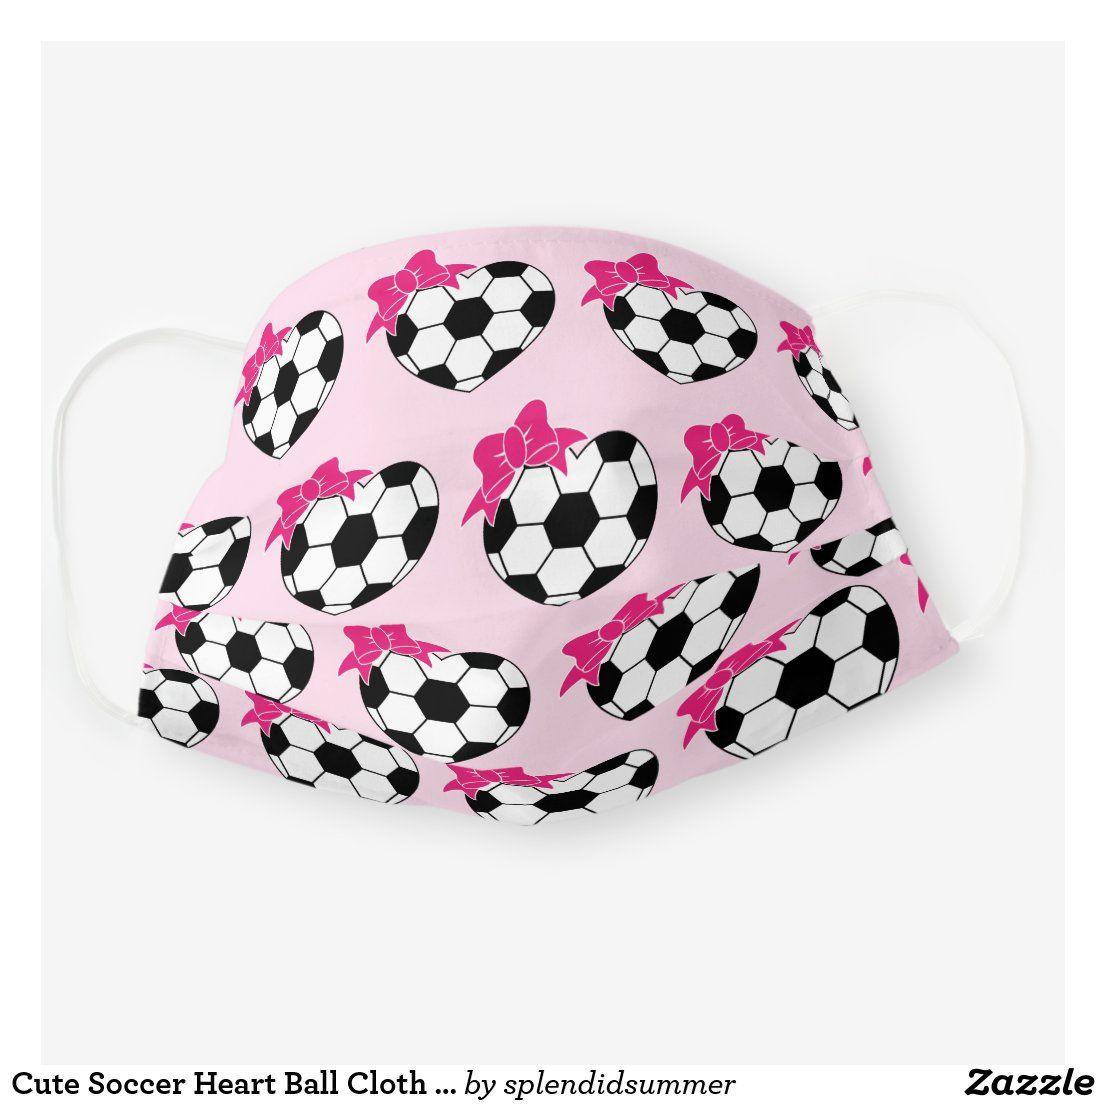 Cute Soccer Heart Ball Cloth Face Mask Zazzle Com In 2020 Face Mask Face Masks For Kids Mask For Kids